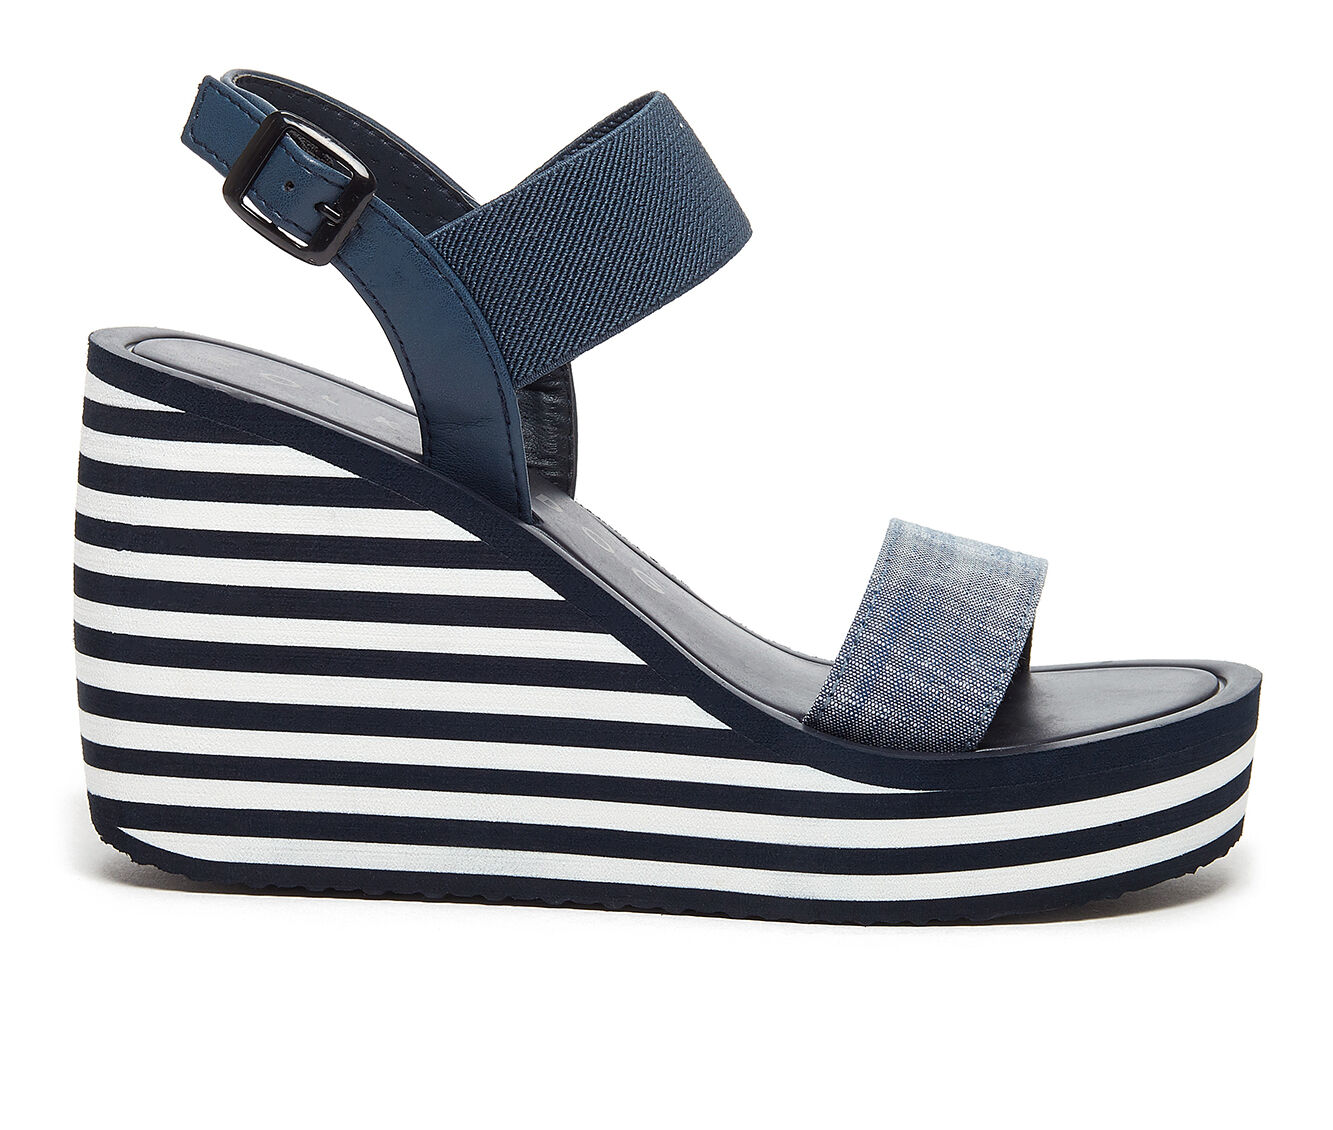 Find Comfortable Women's Rocket Dog Tampico Wedge Sandals Blue/Navy/White